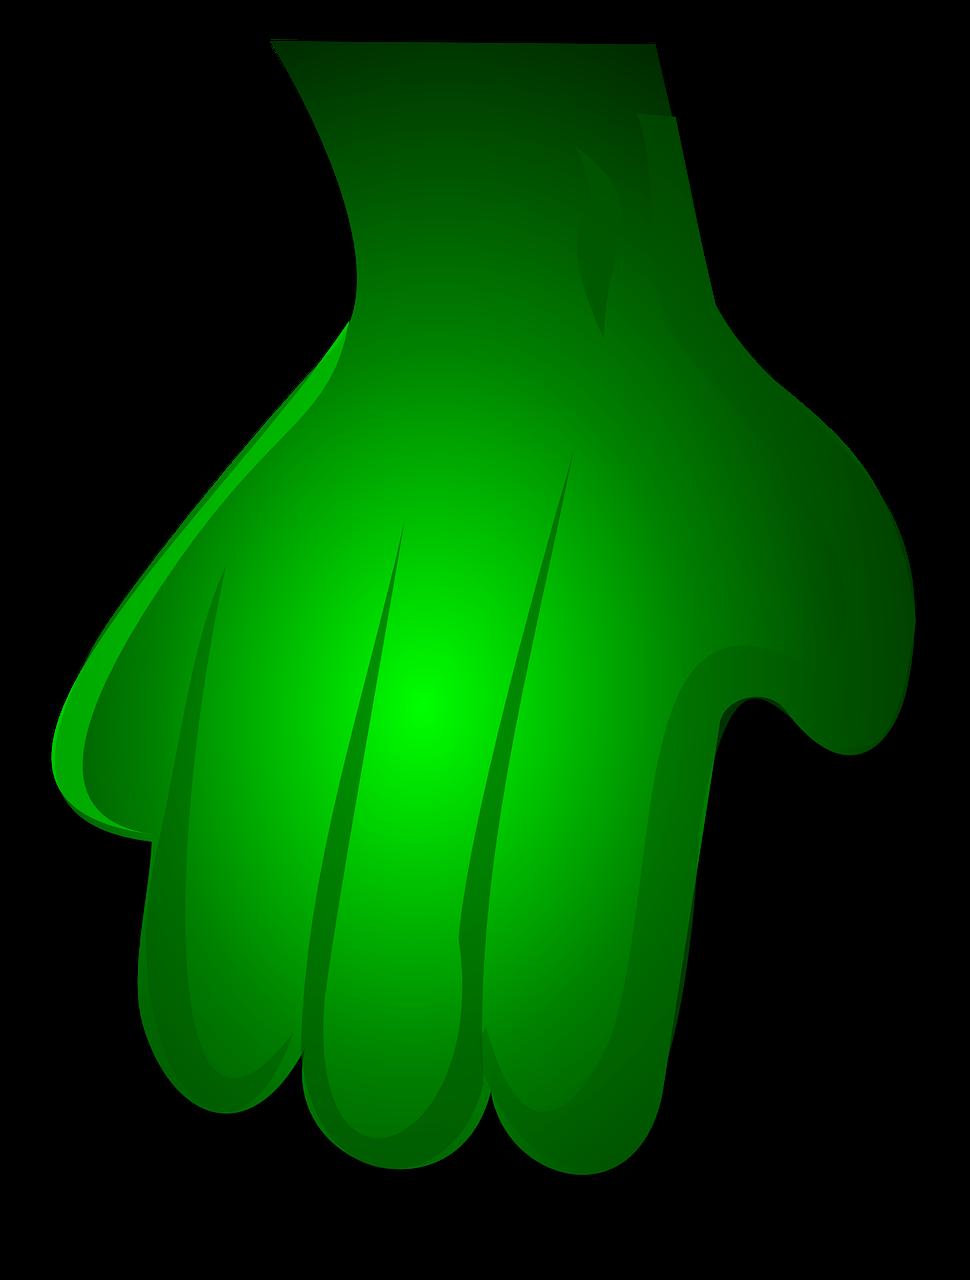 Monster transparent image pinterest. Zombie clipart green hand